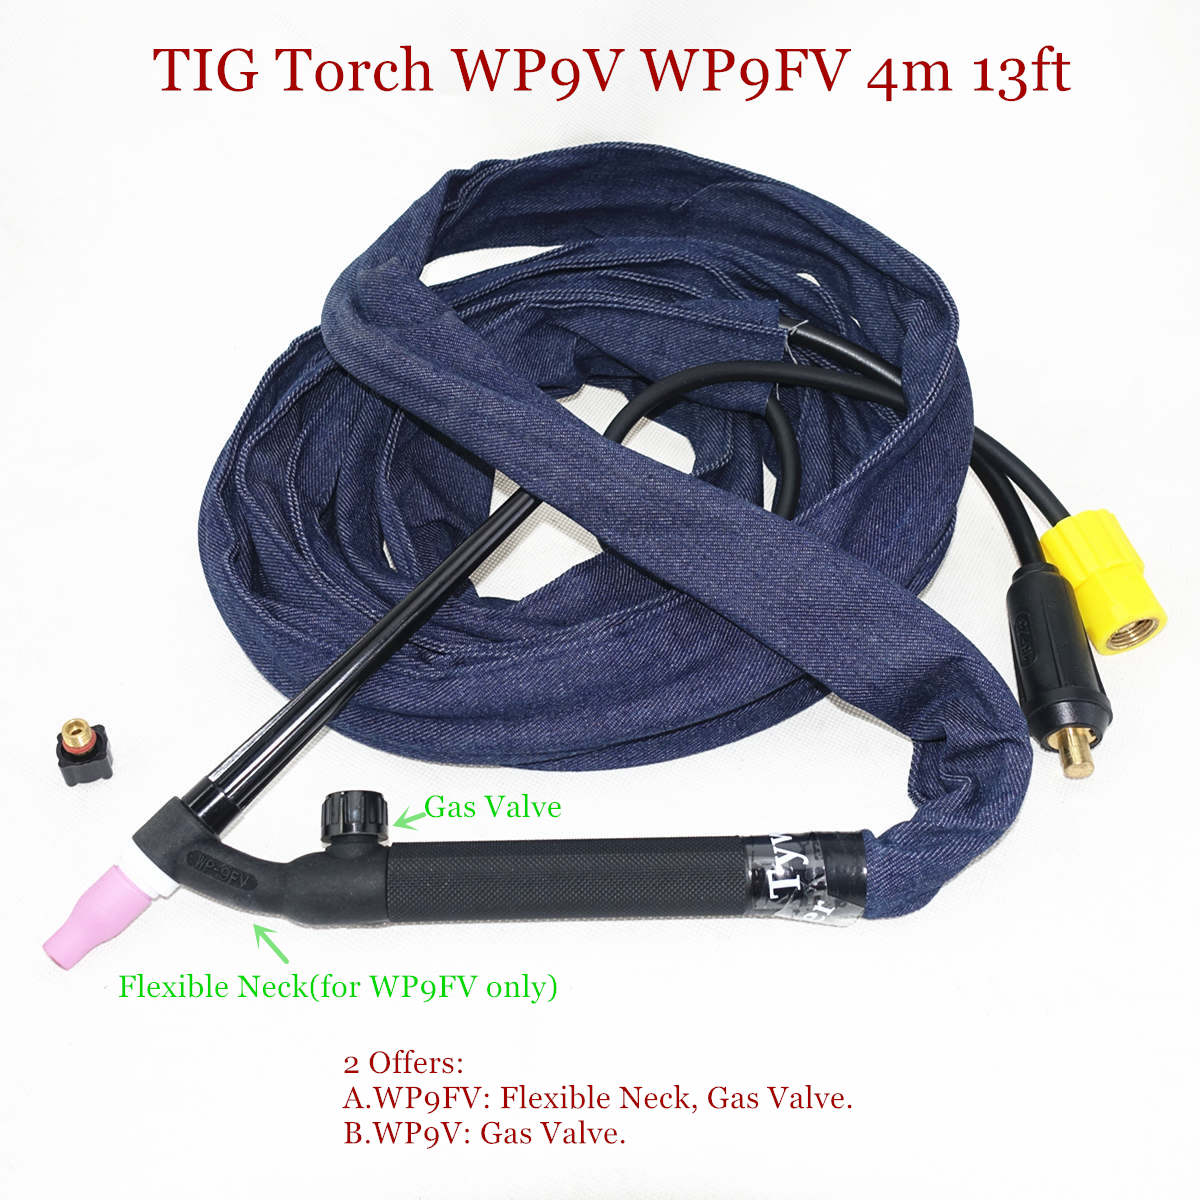 WP9FV TIG Torch 4m 13ft Gas Tungsten Arc Welding Torch WP9 Argon Air Cooled Flexible Neck Gas Valve TIG Welding Torch